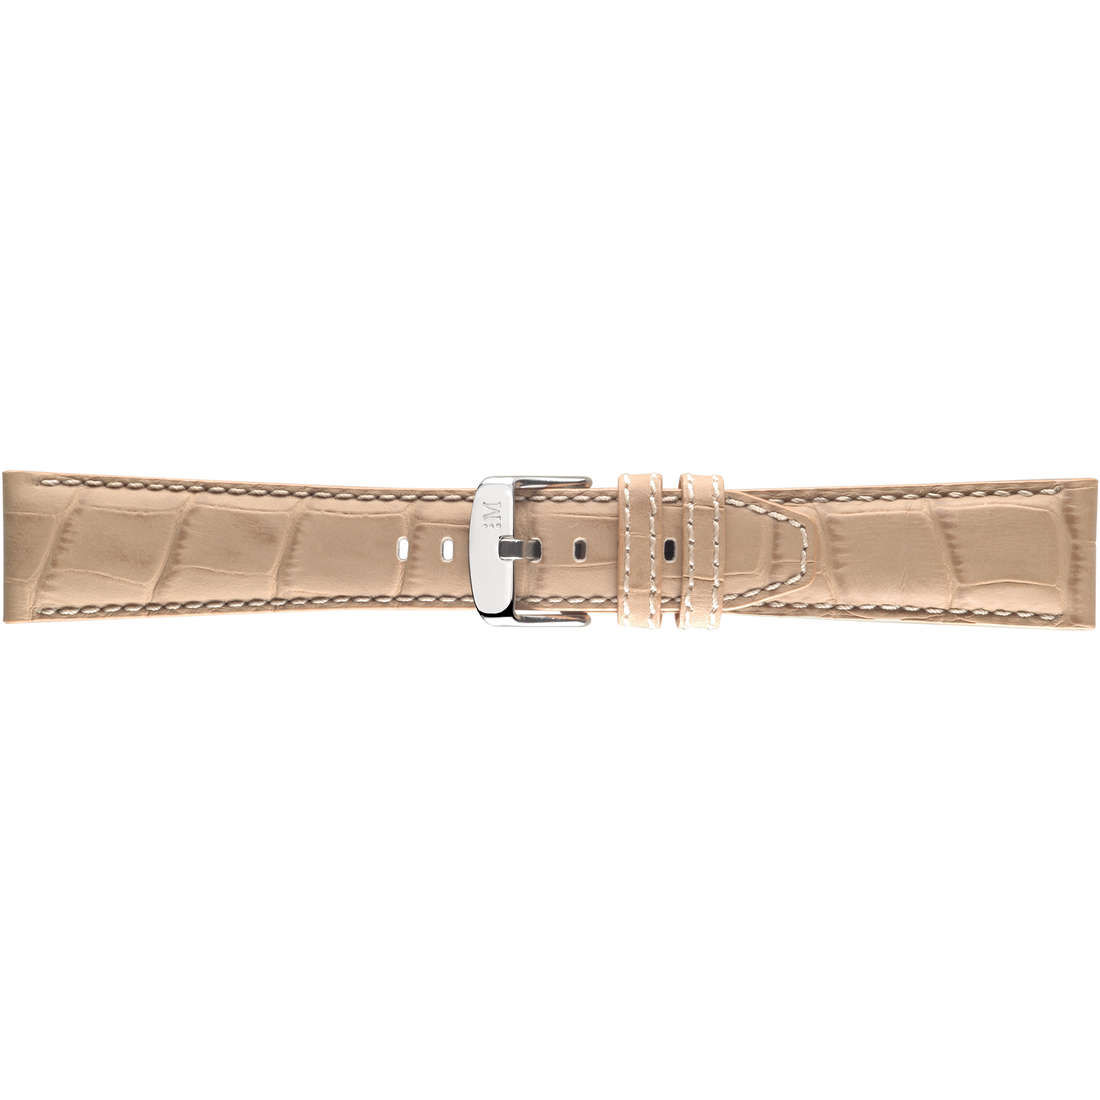 watch watch bands watch straps man Morellato Linea Sport A01X4497B44027CR18